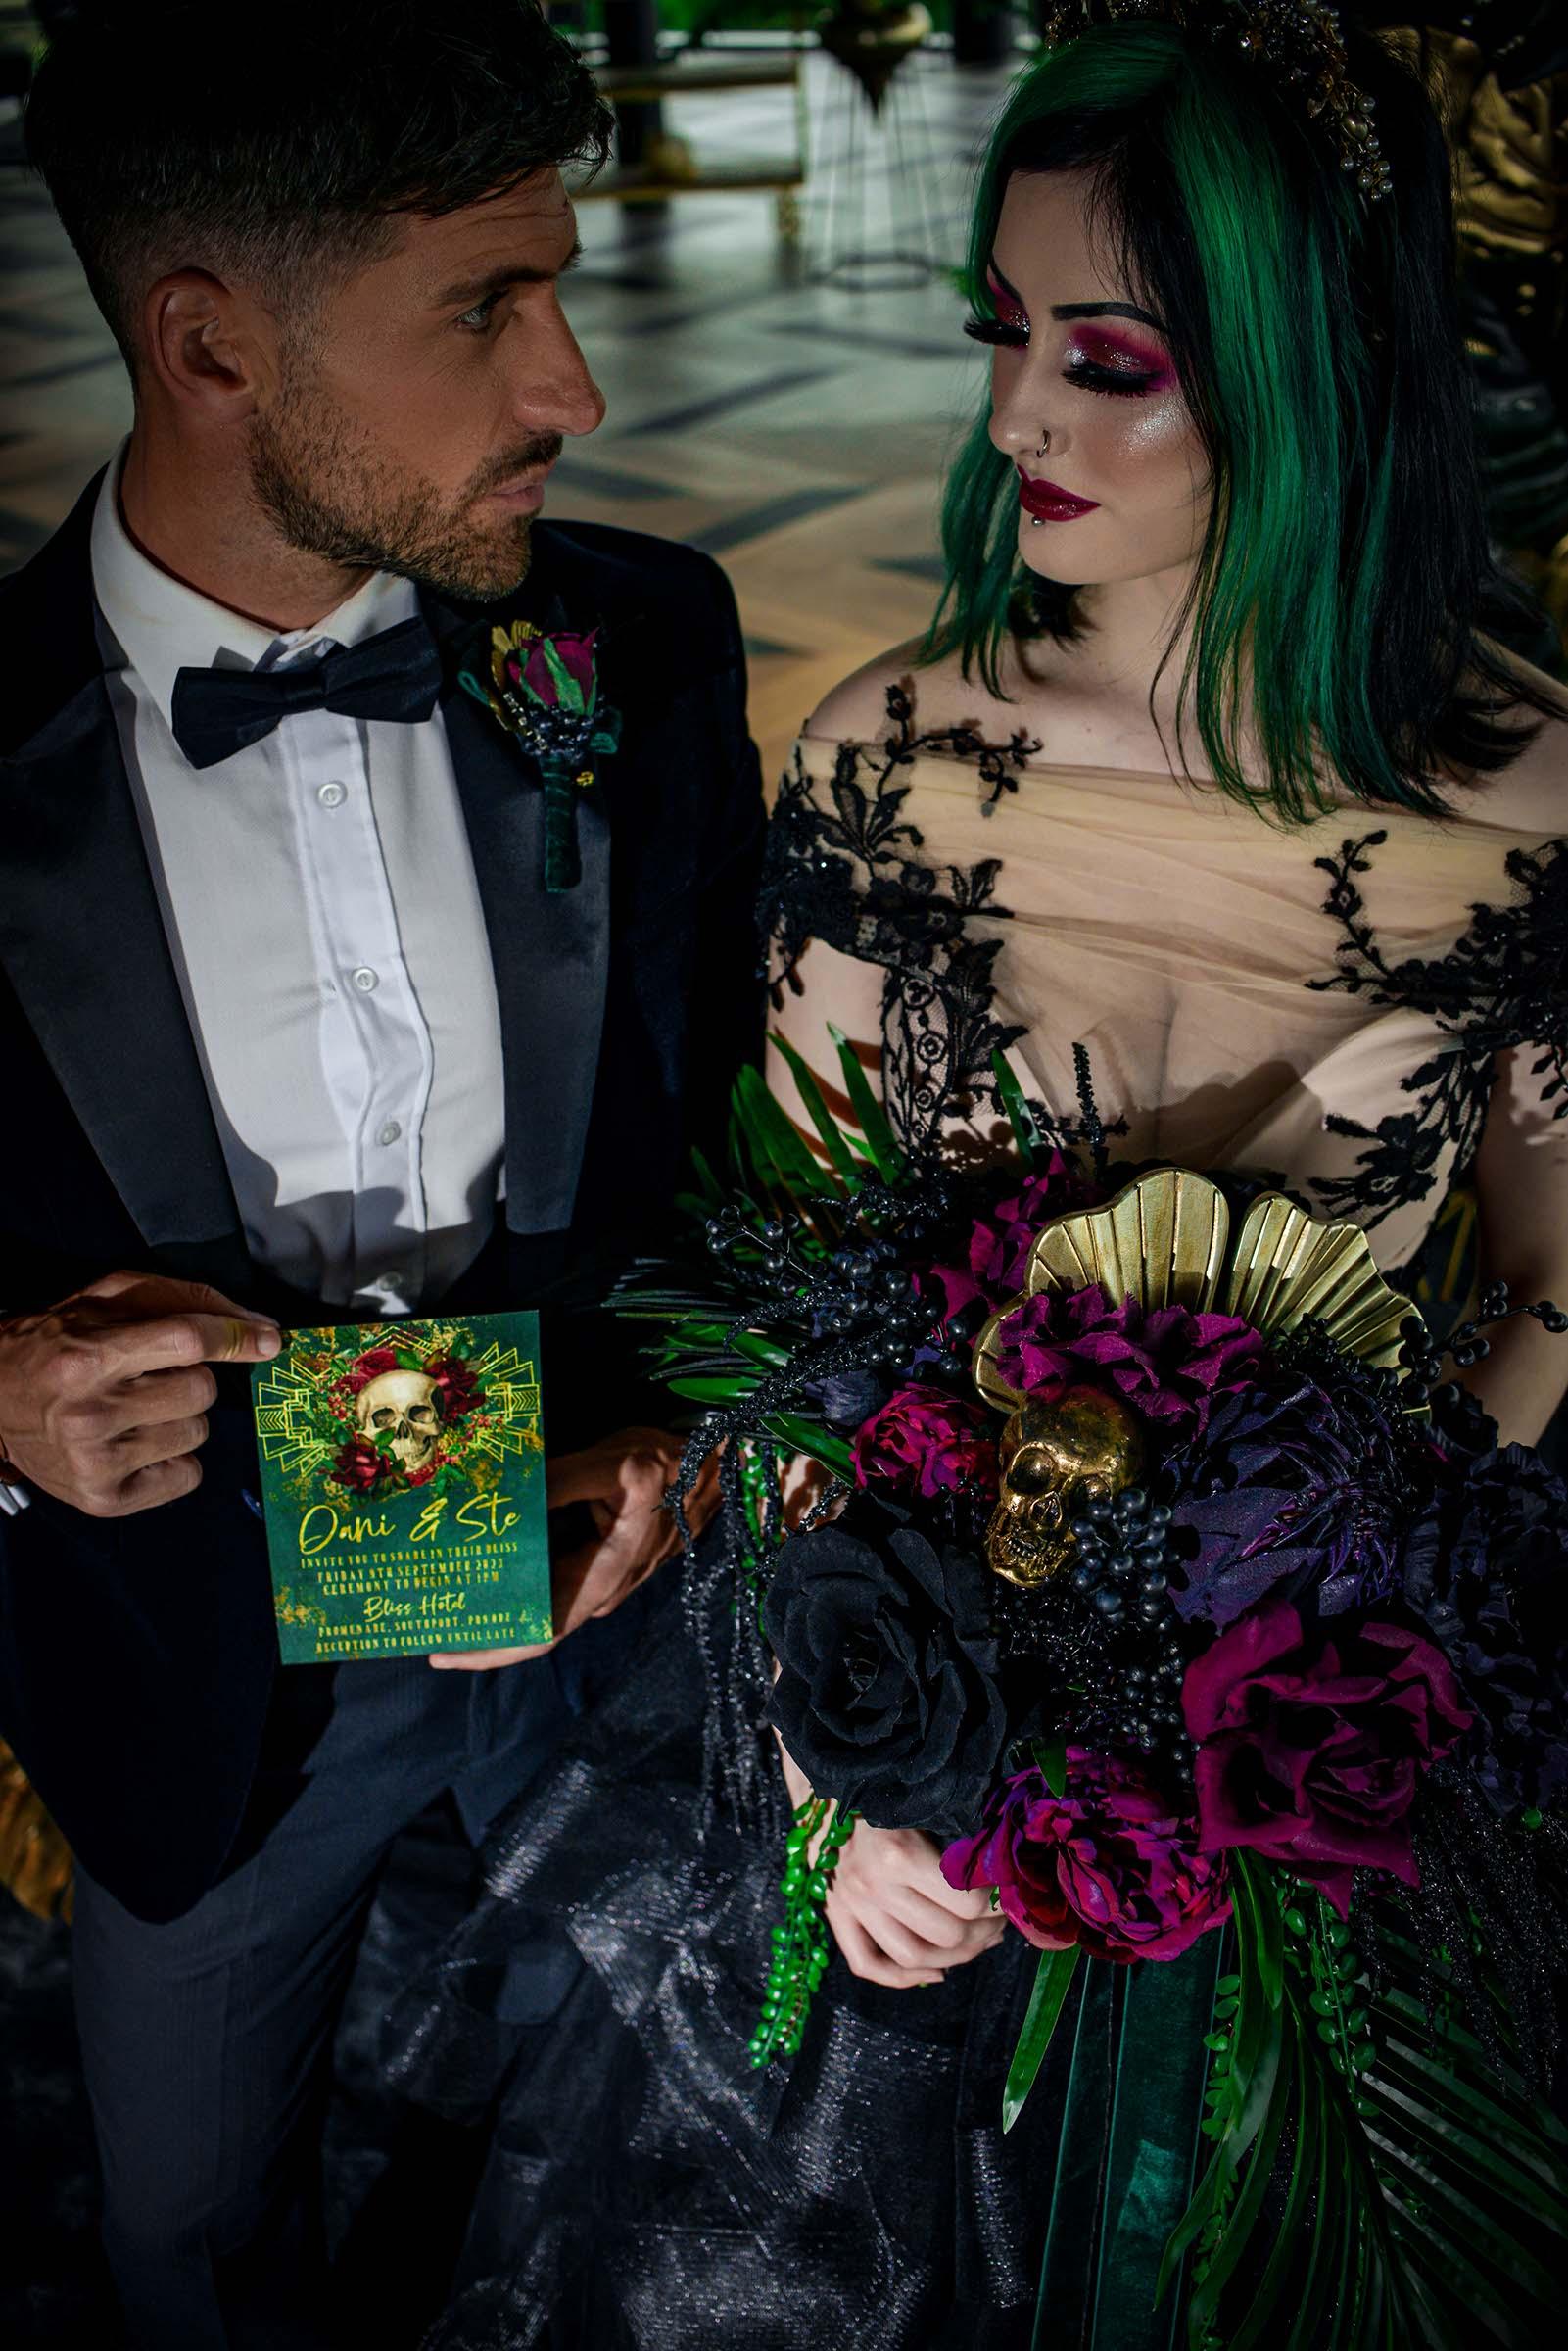 alternative luxe wedding - slytherin wedding - gothic wedding - alternative wedding - gothic wedding flowers - alternative wedding stationery